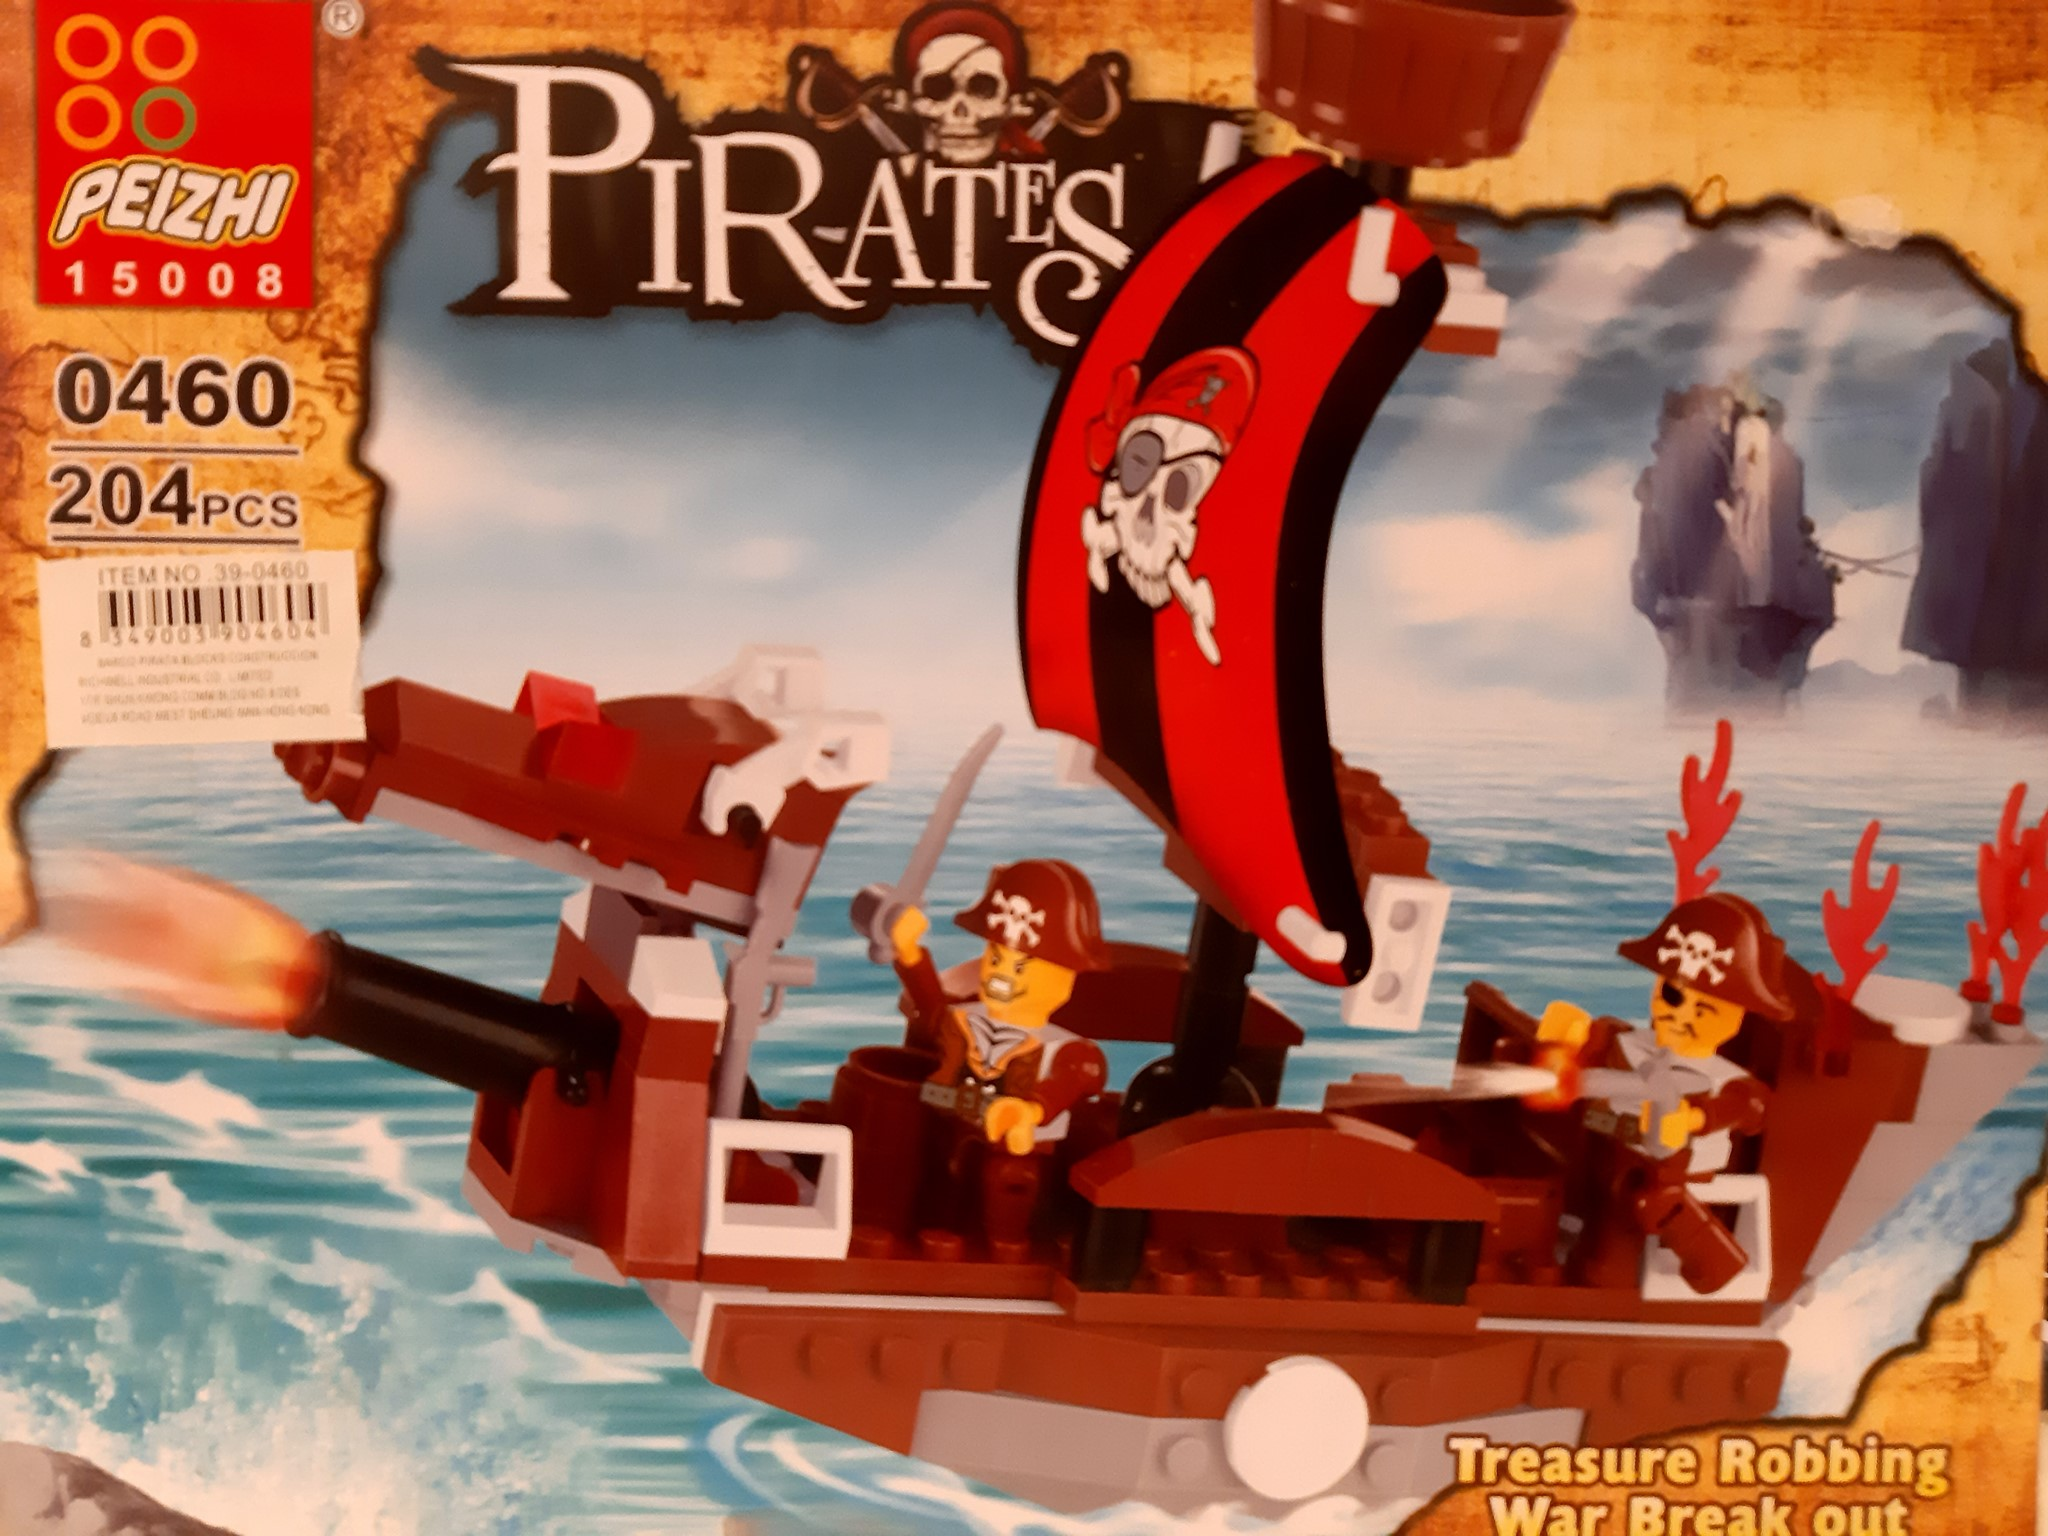 TREASURE ROBBING WAR BREAK OUT LEGO 204PCS 904604